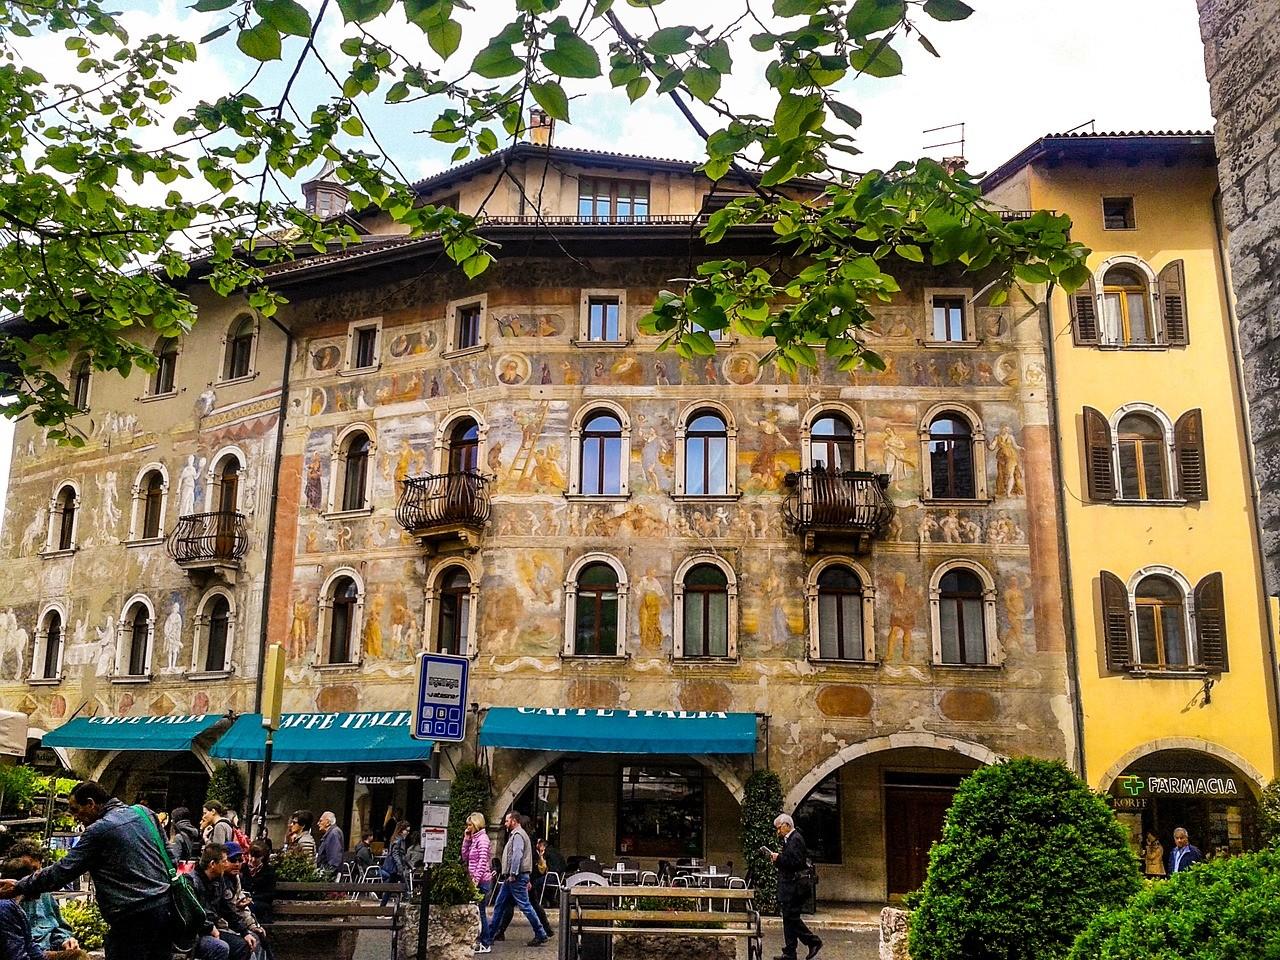 Experiencia en Trento, Italia de Irina